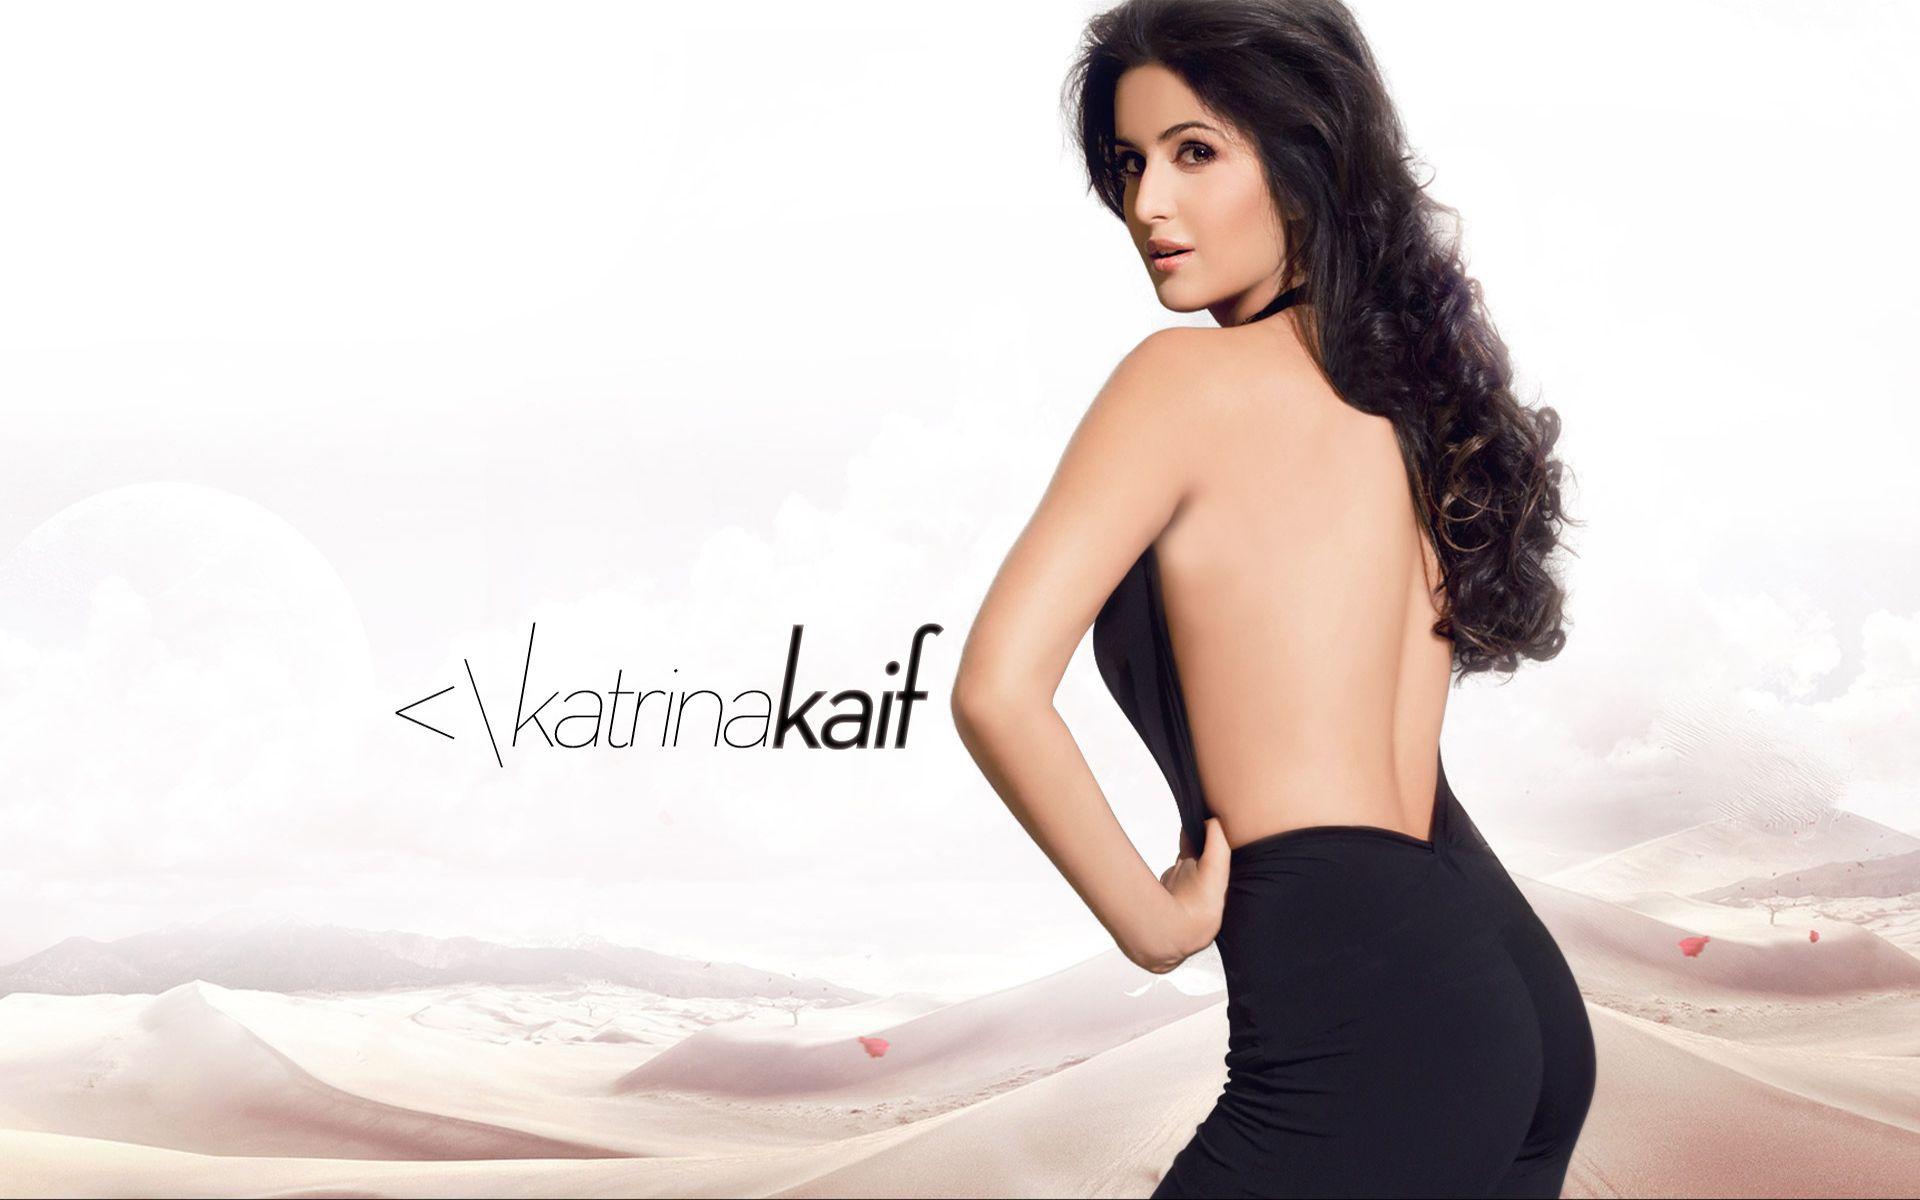 katrina-kaif-hot-vagania-hardcore-strip-gif